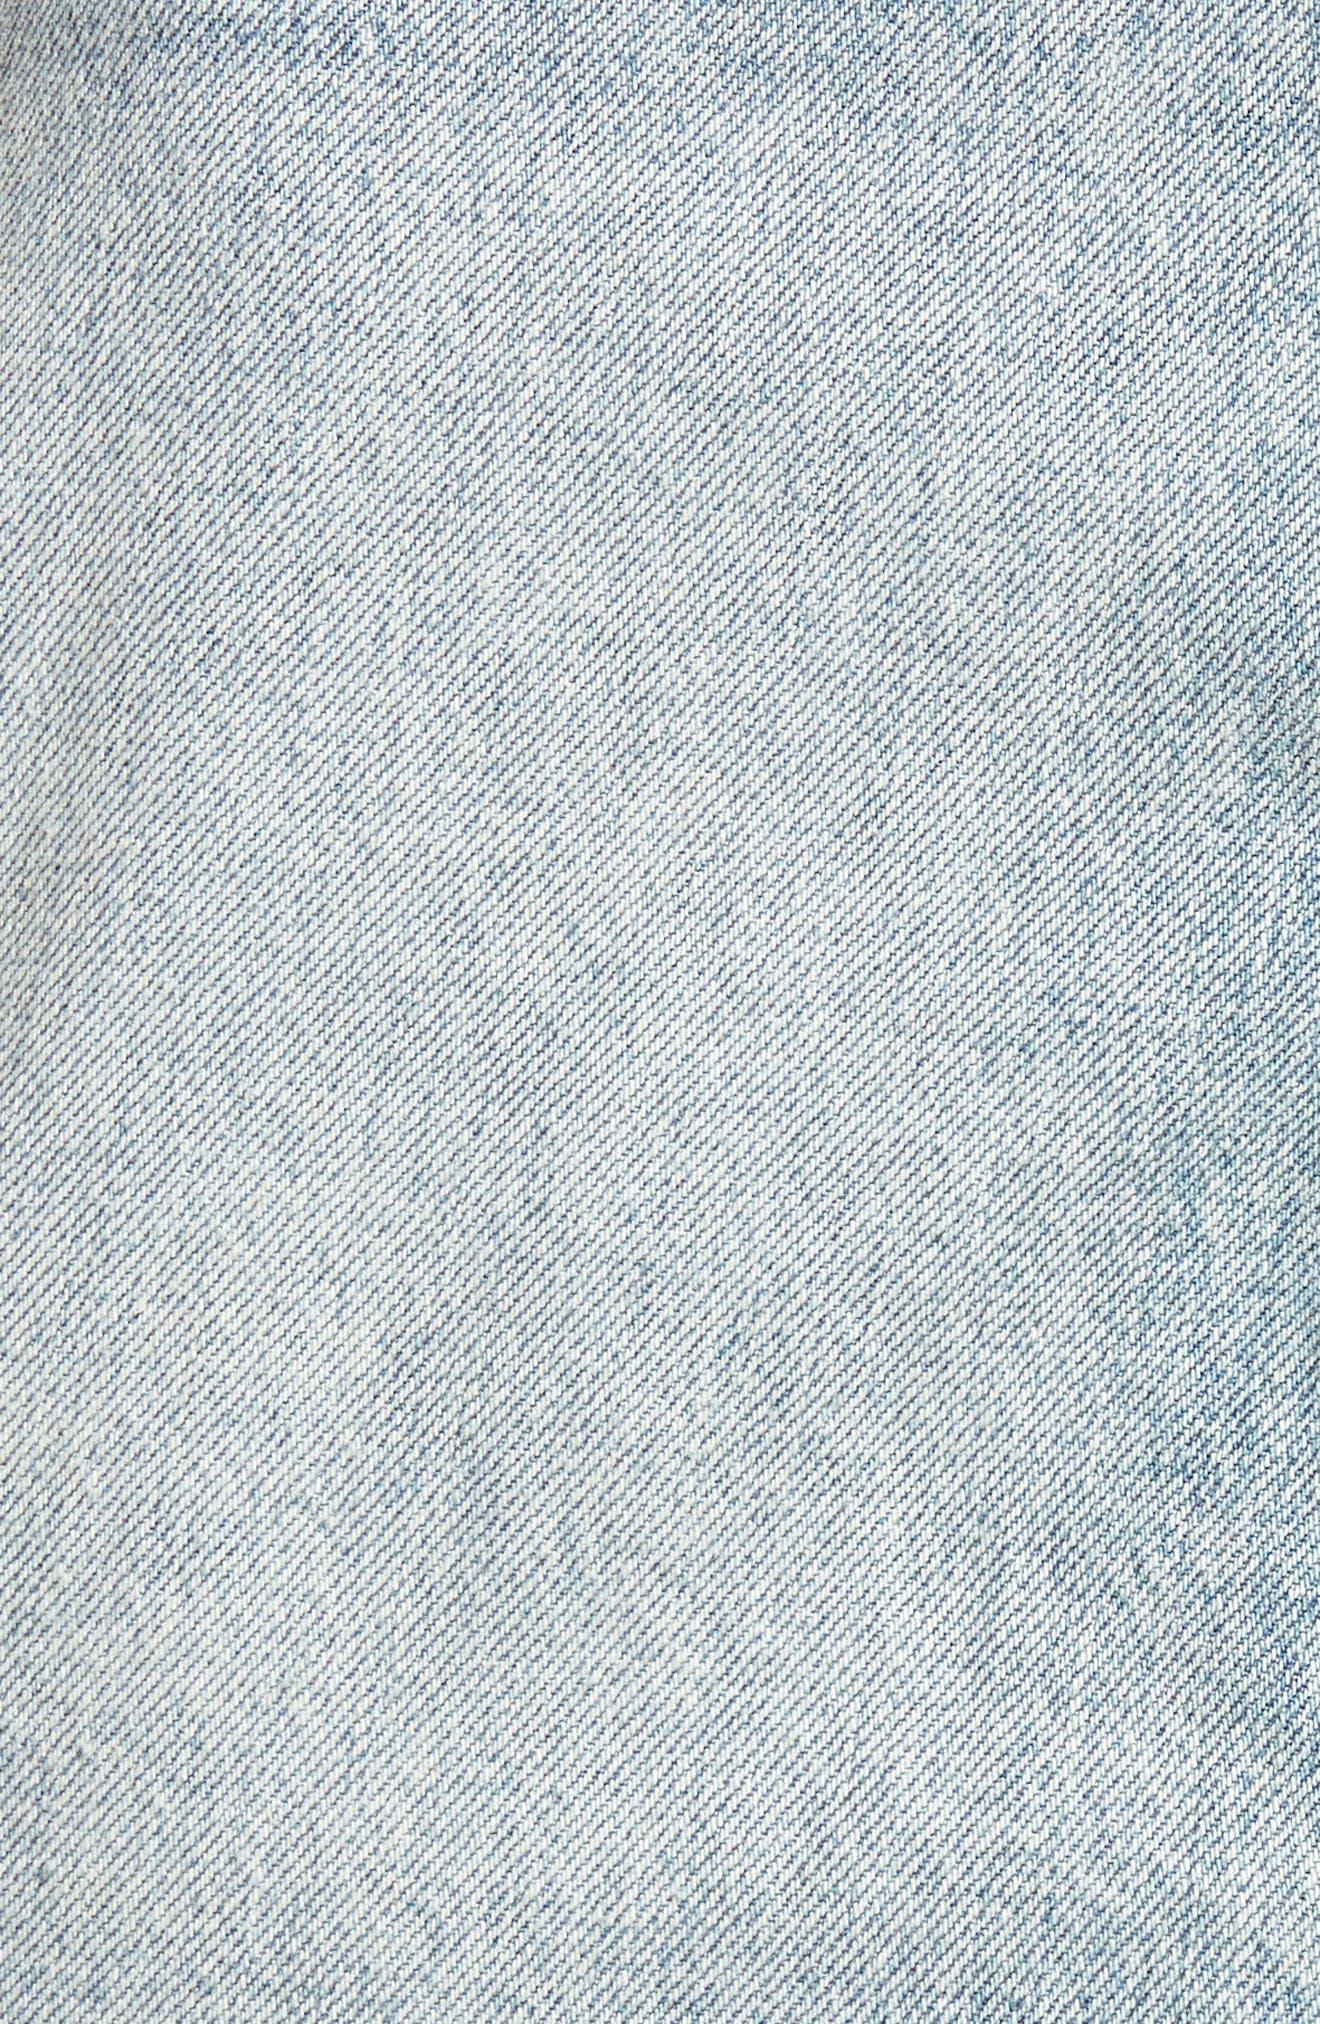 Vivid Cutoff Denim Miniskirt,                             Alternate thumbnail 6, color,